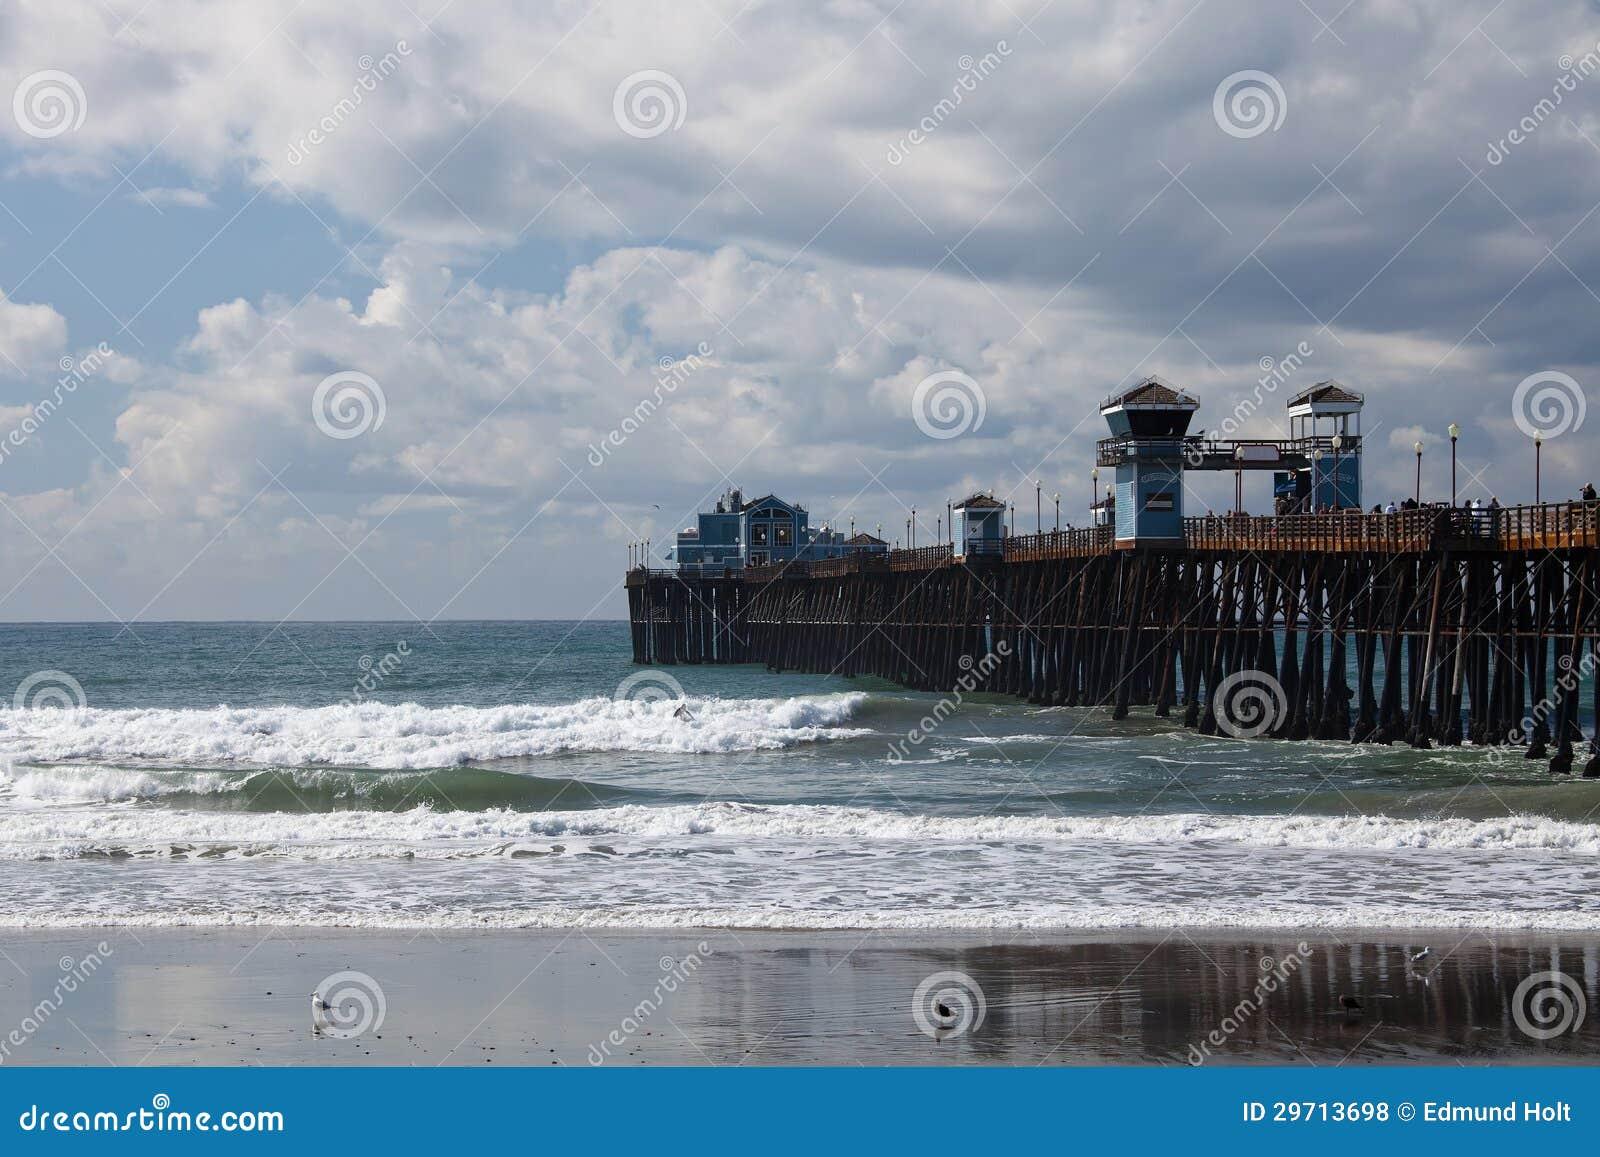 Oceanside Pier, Caifornia